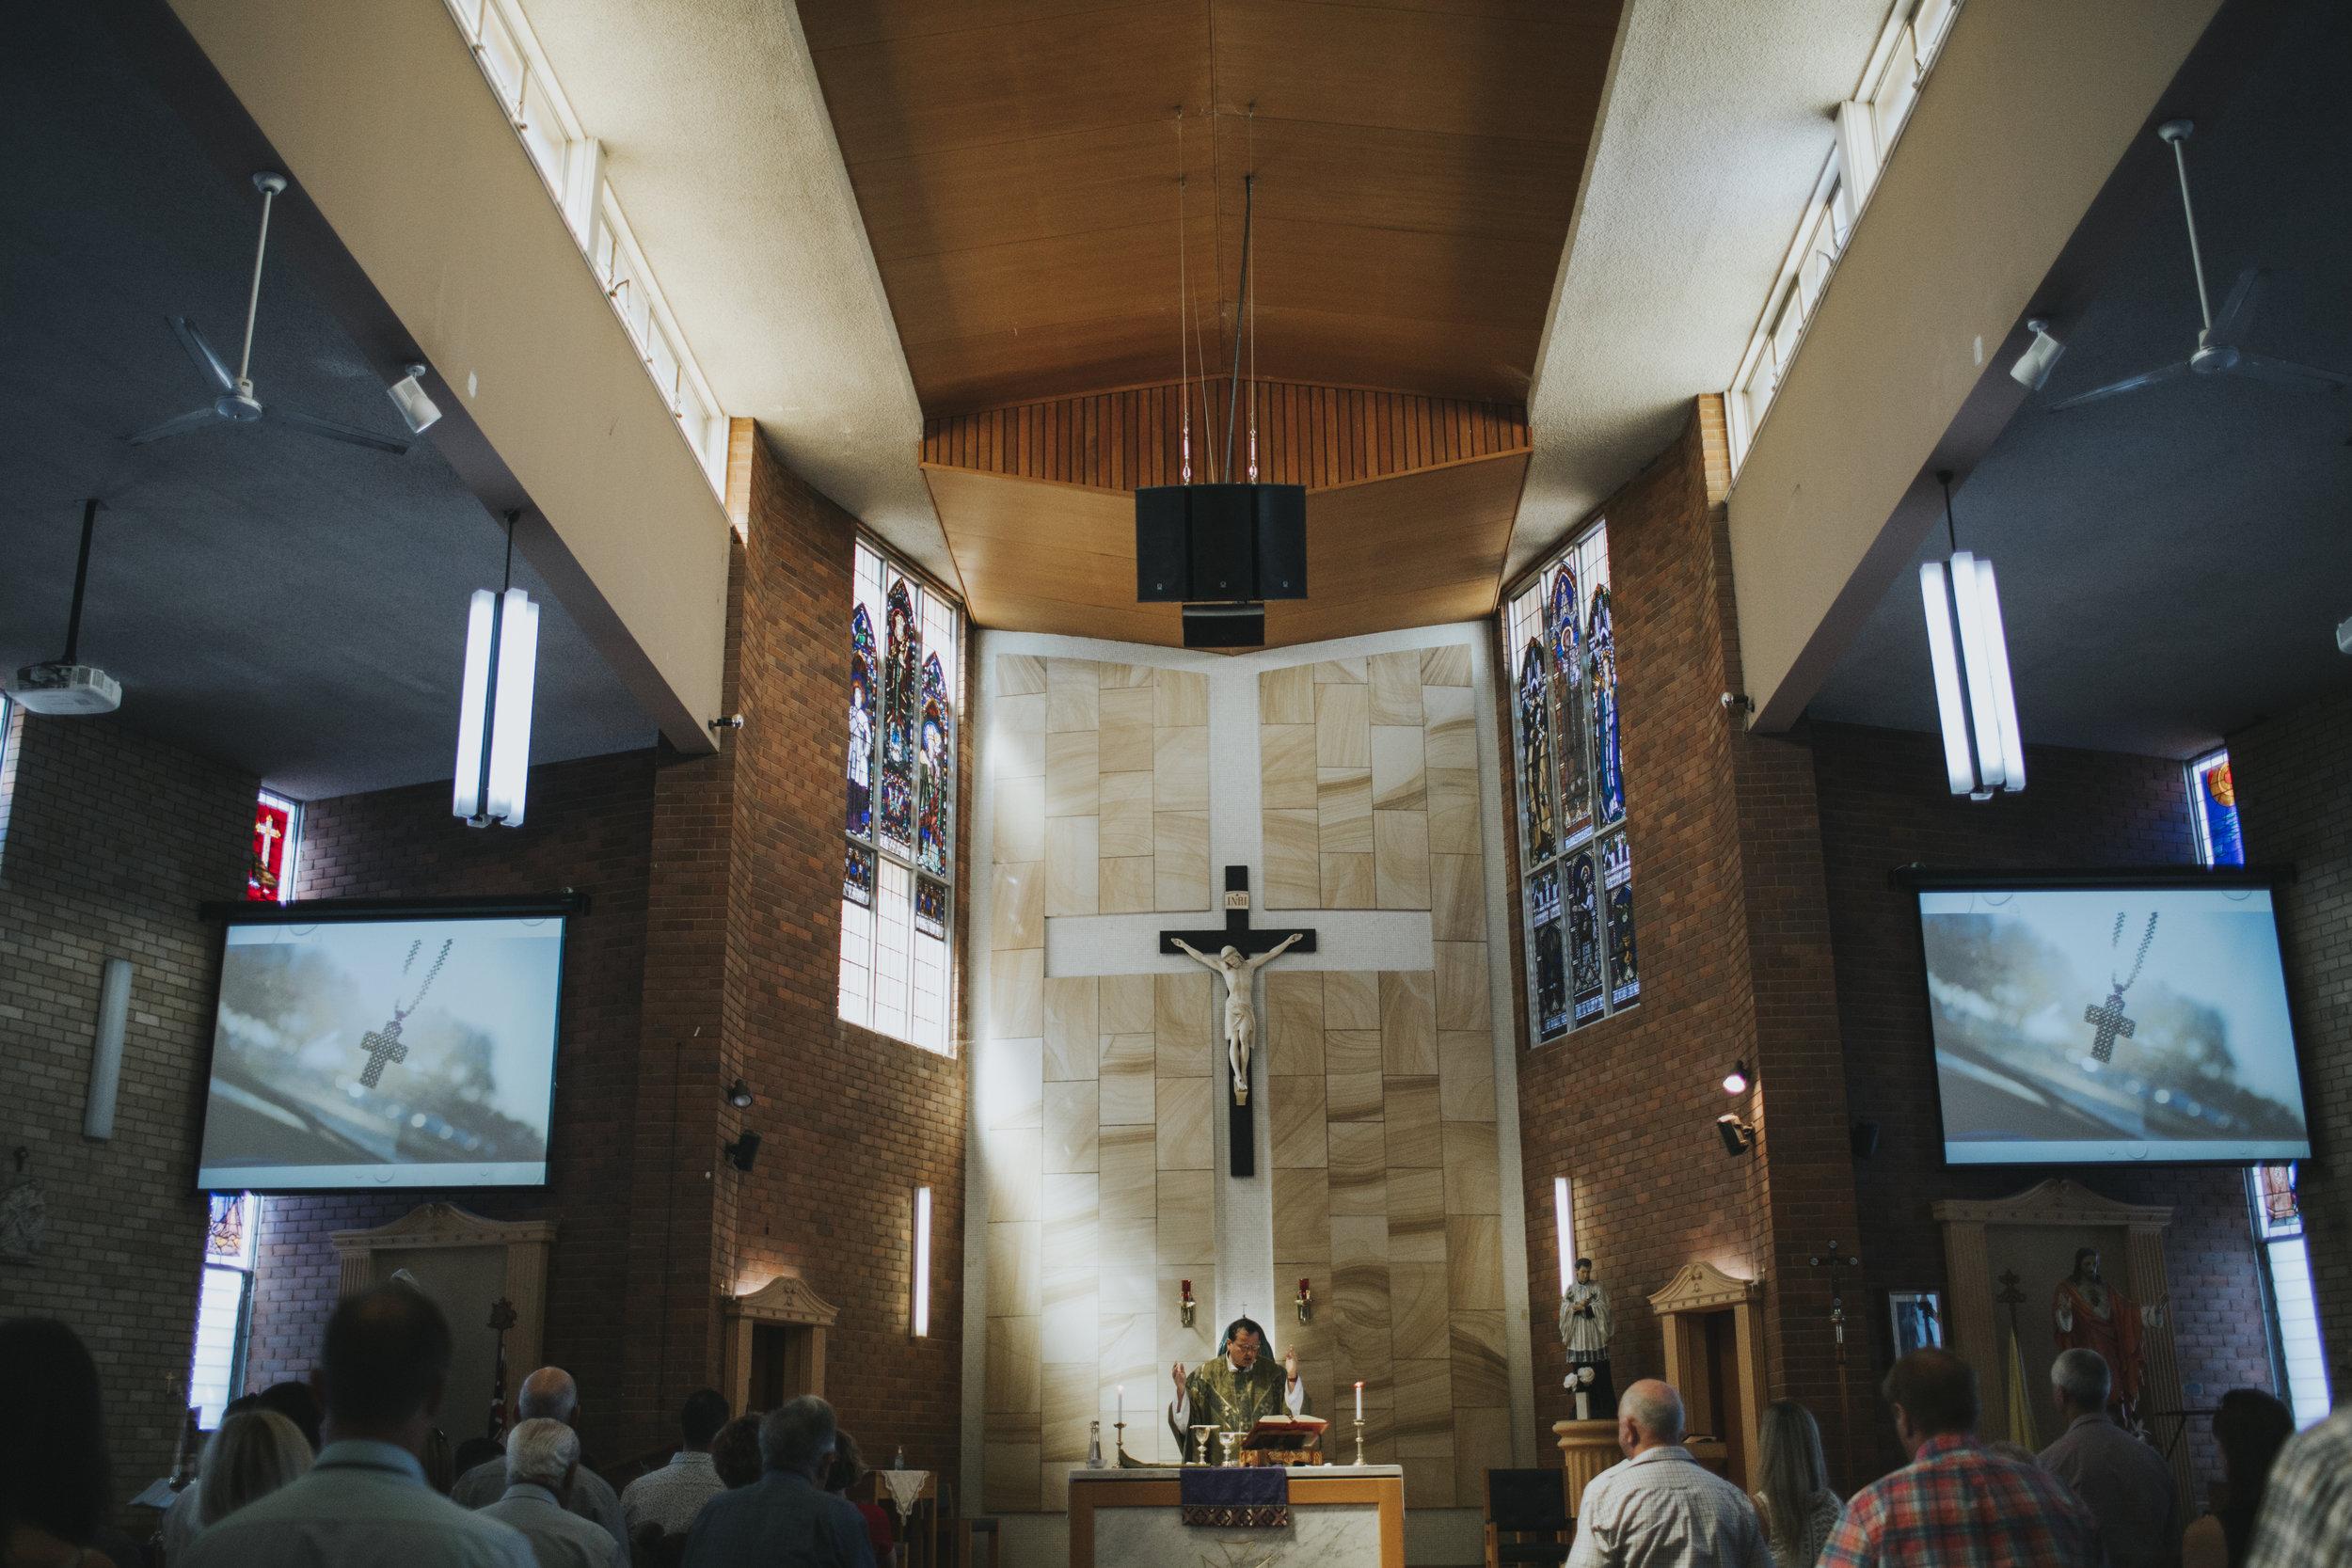 christening_sydney_cronulla_st_aloysius_shire-1858.jpg